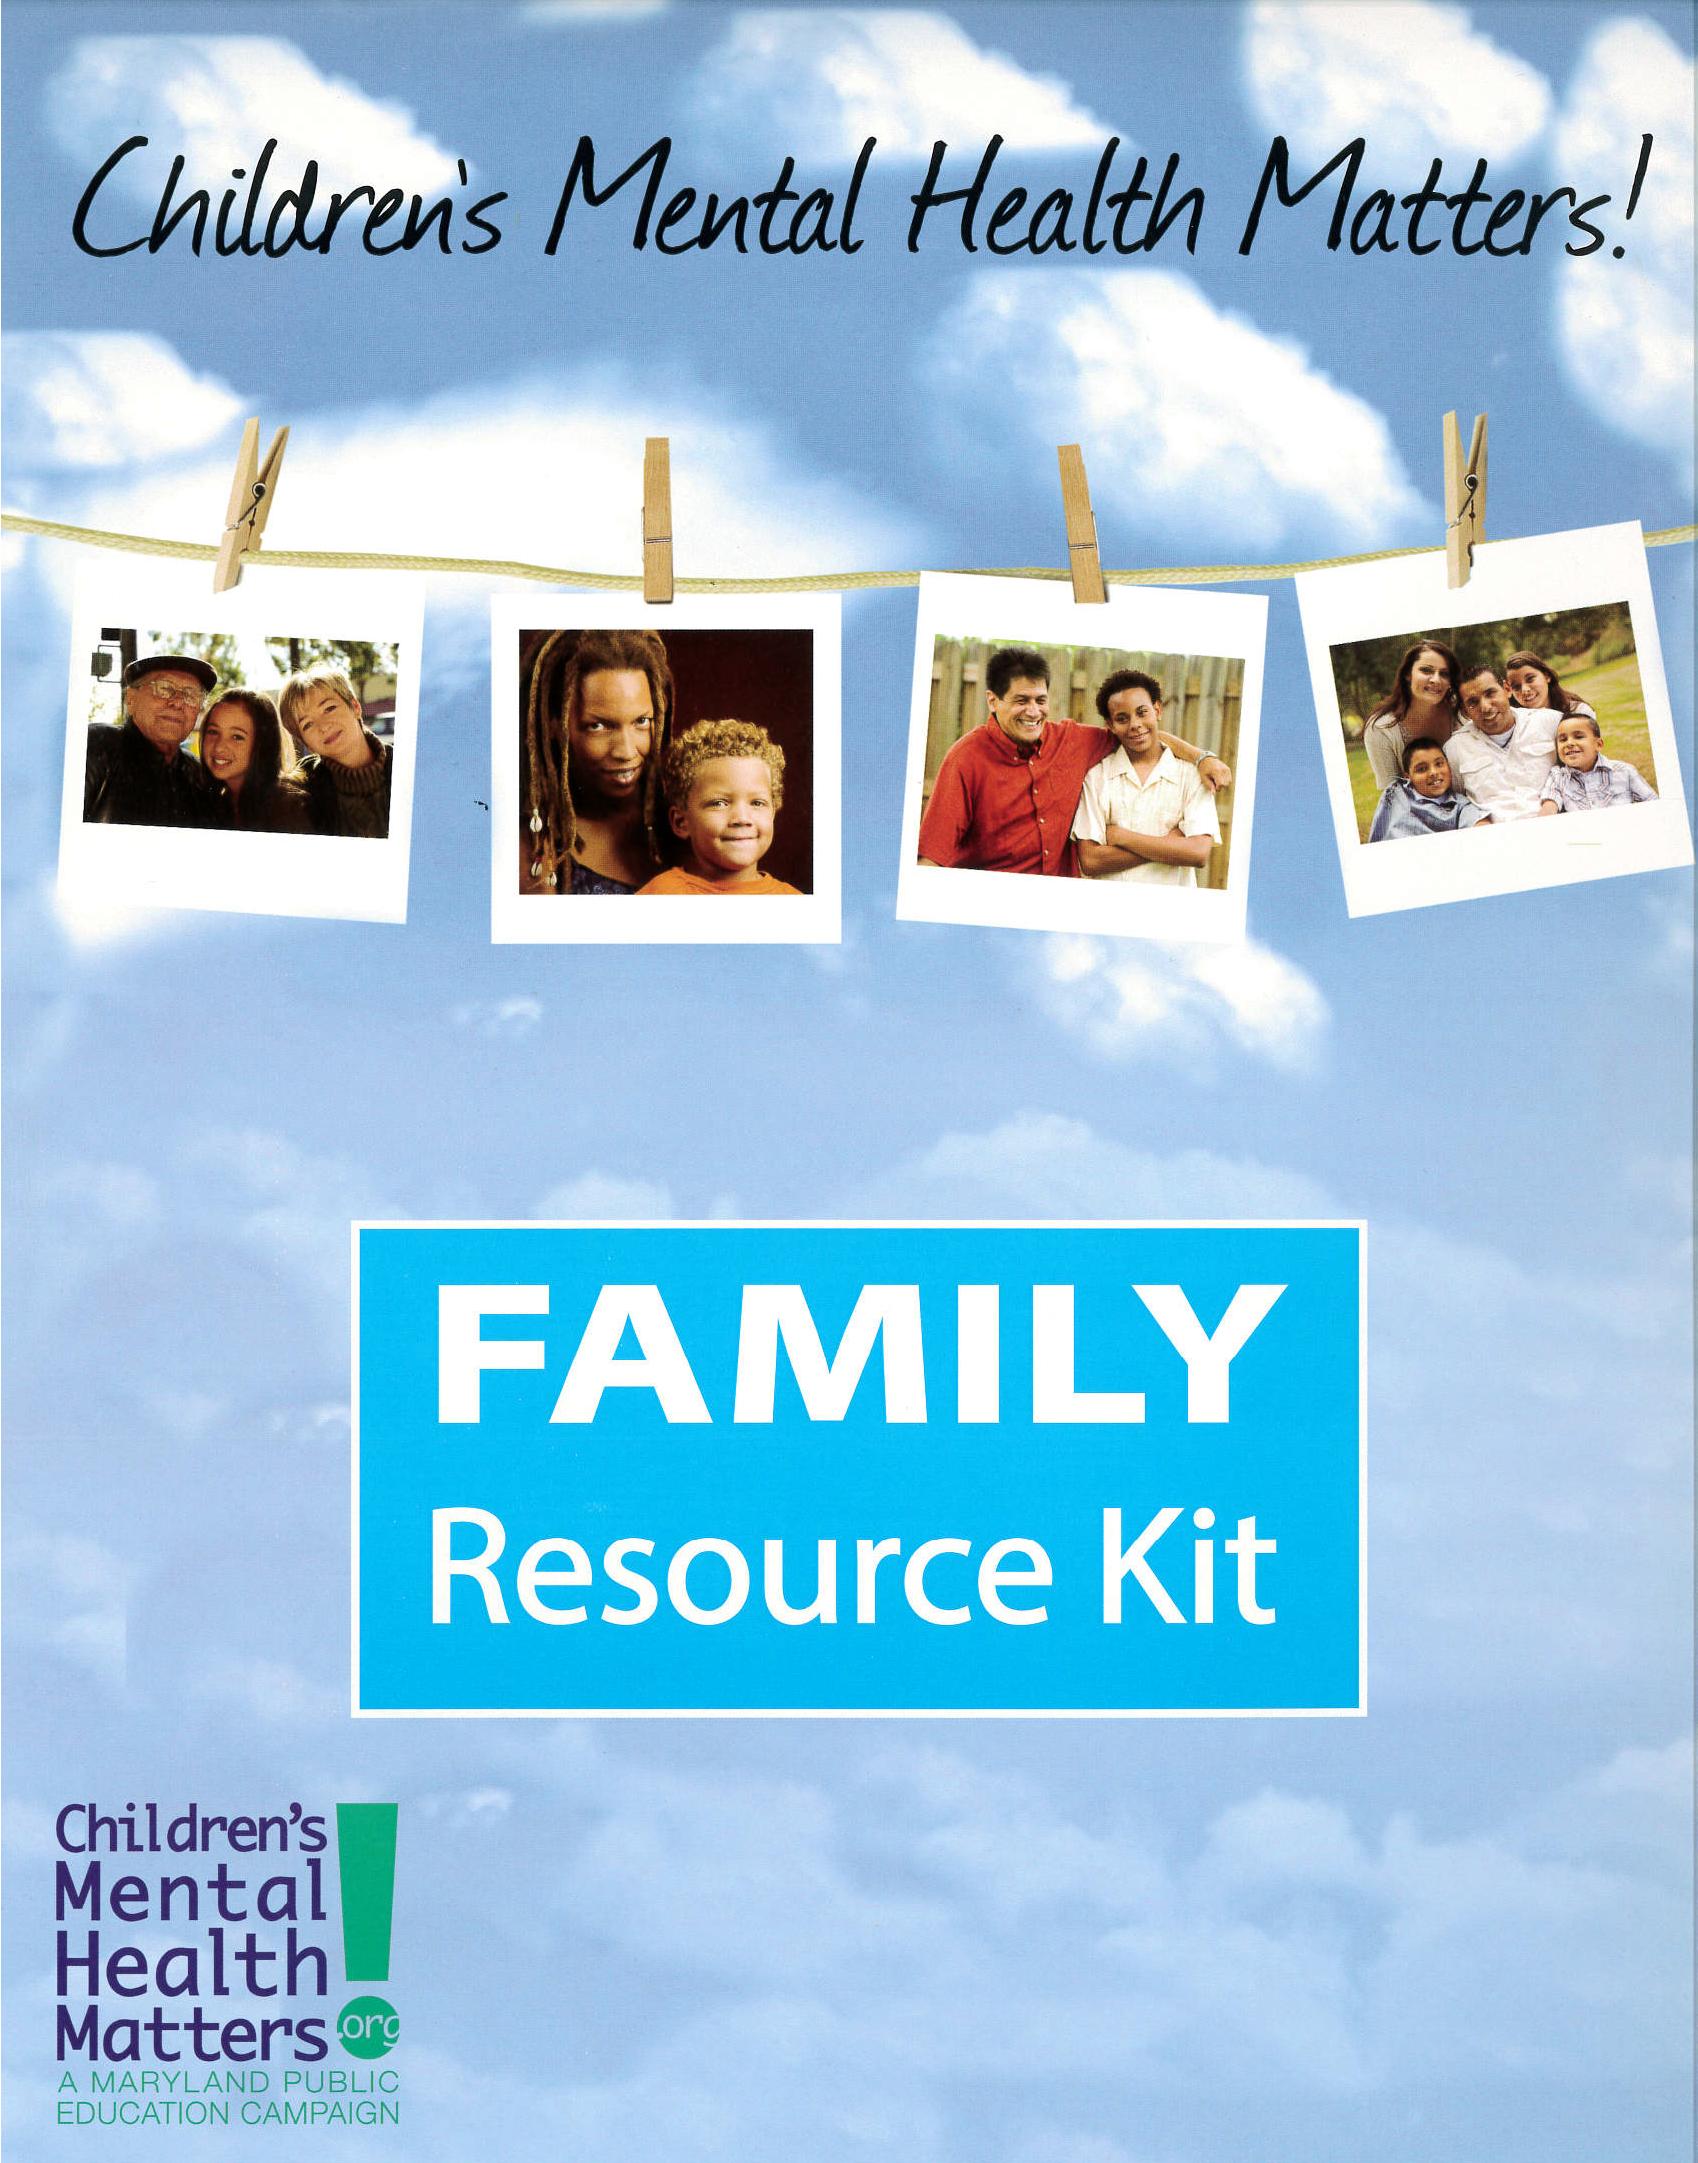 Children's Mental Health Matters Family Resource Kit